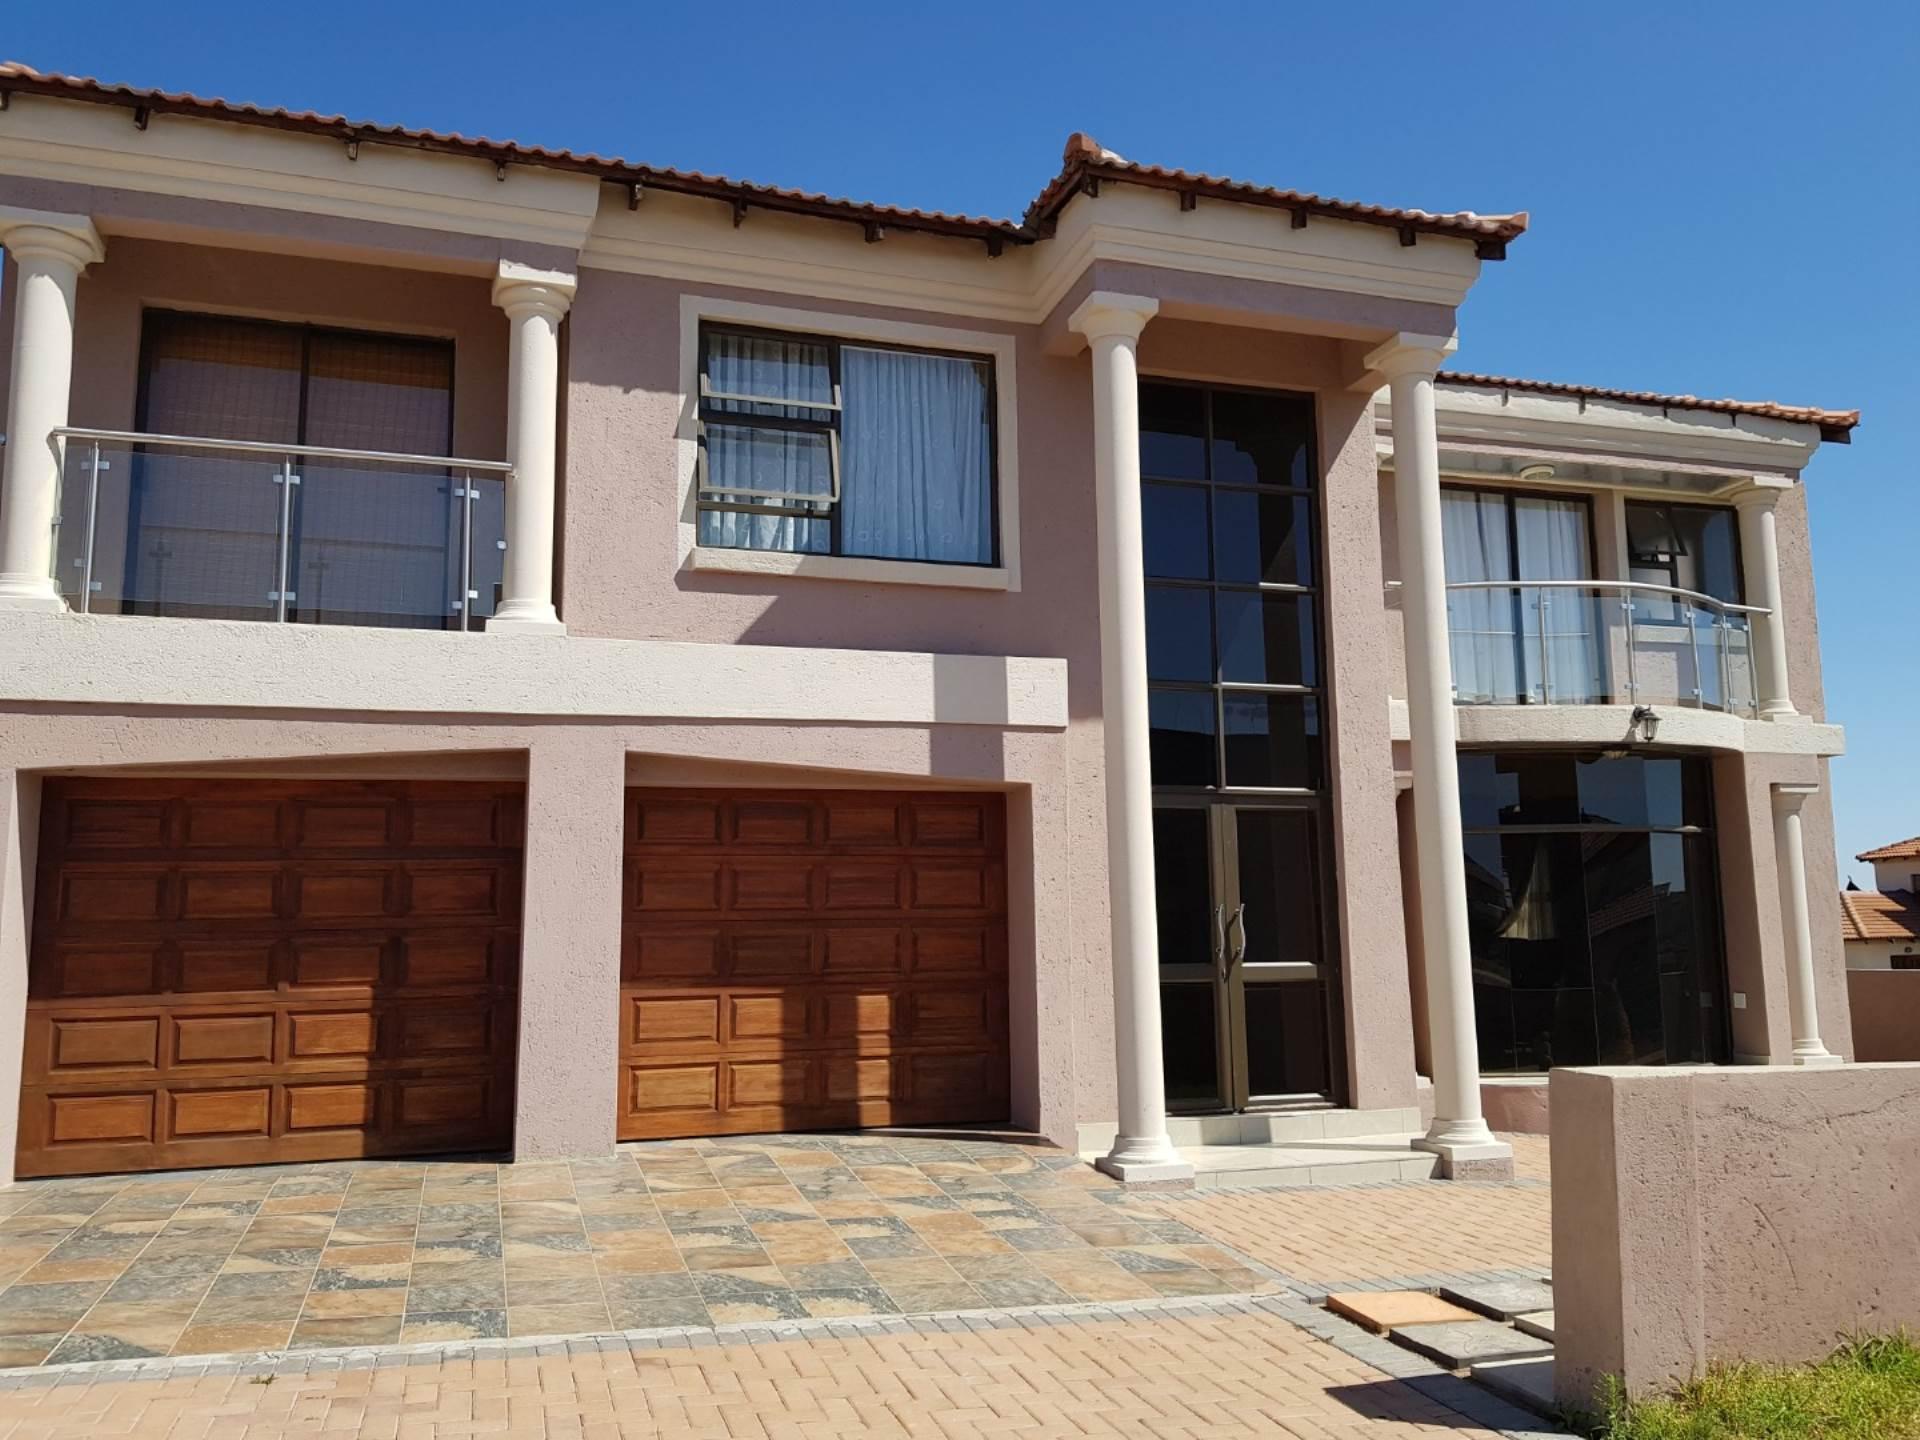 5 BedroomHouse For Sale In Bendor